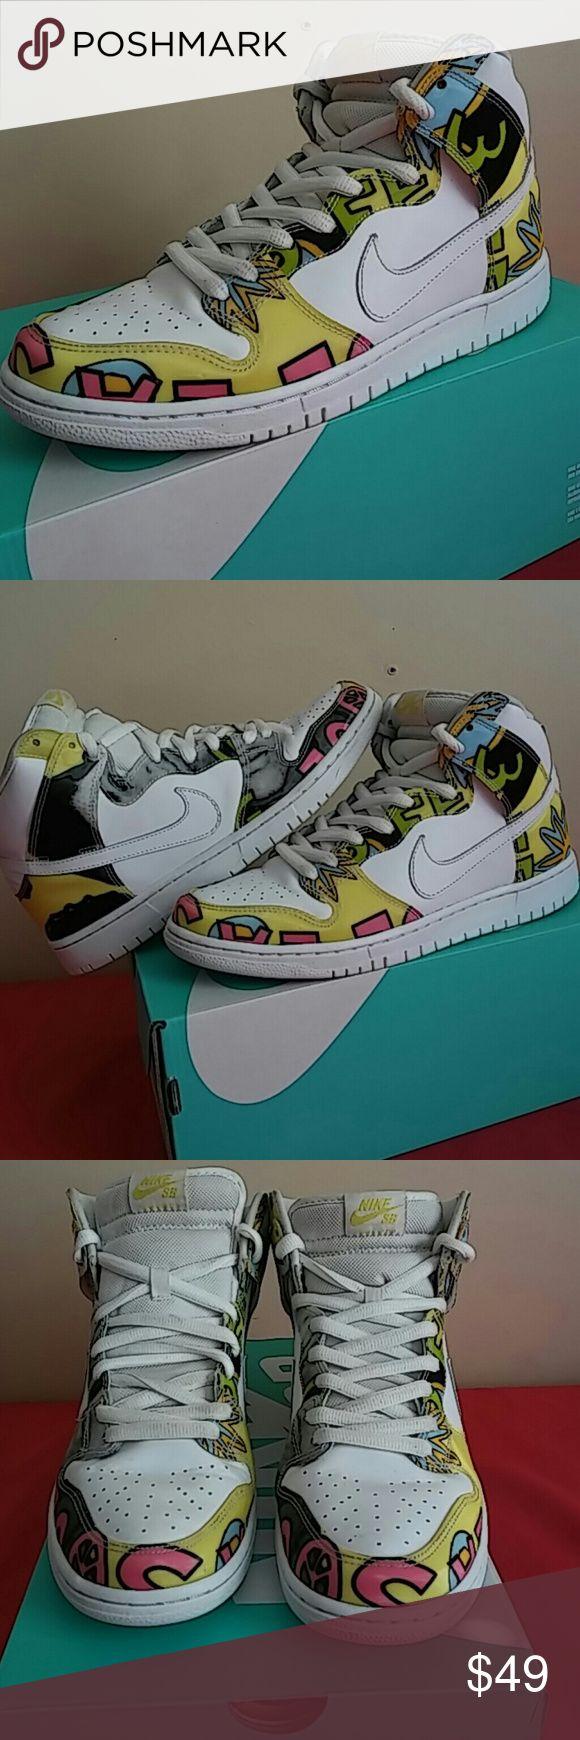 newest d8489 7f10b Nike SB Dunk High Cali Review + On Feet  Nike SB Dunk High DSL QS DE LA  SOUL Size10.5